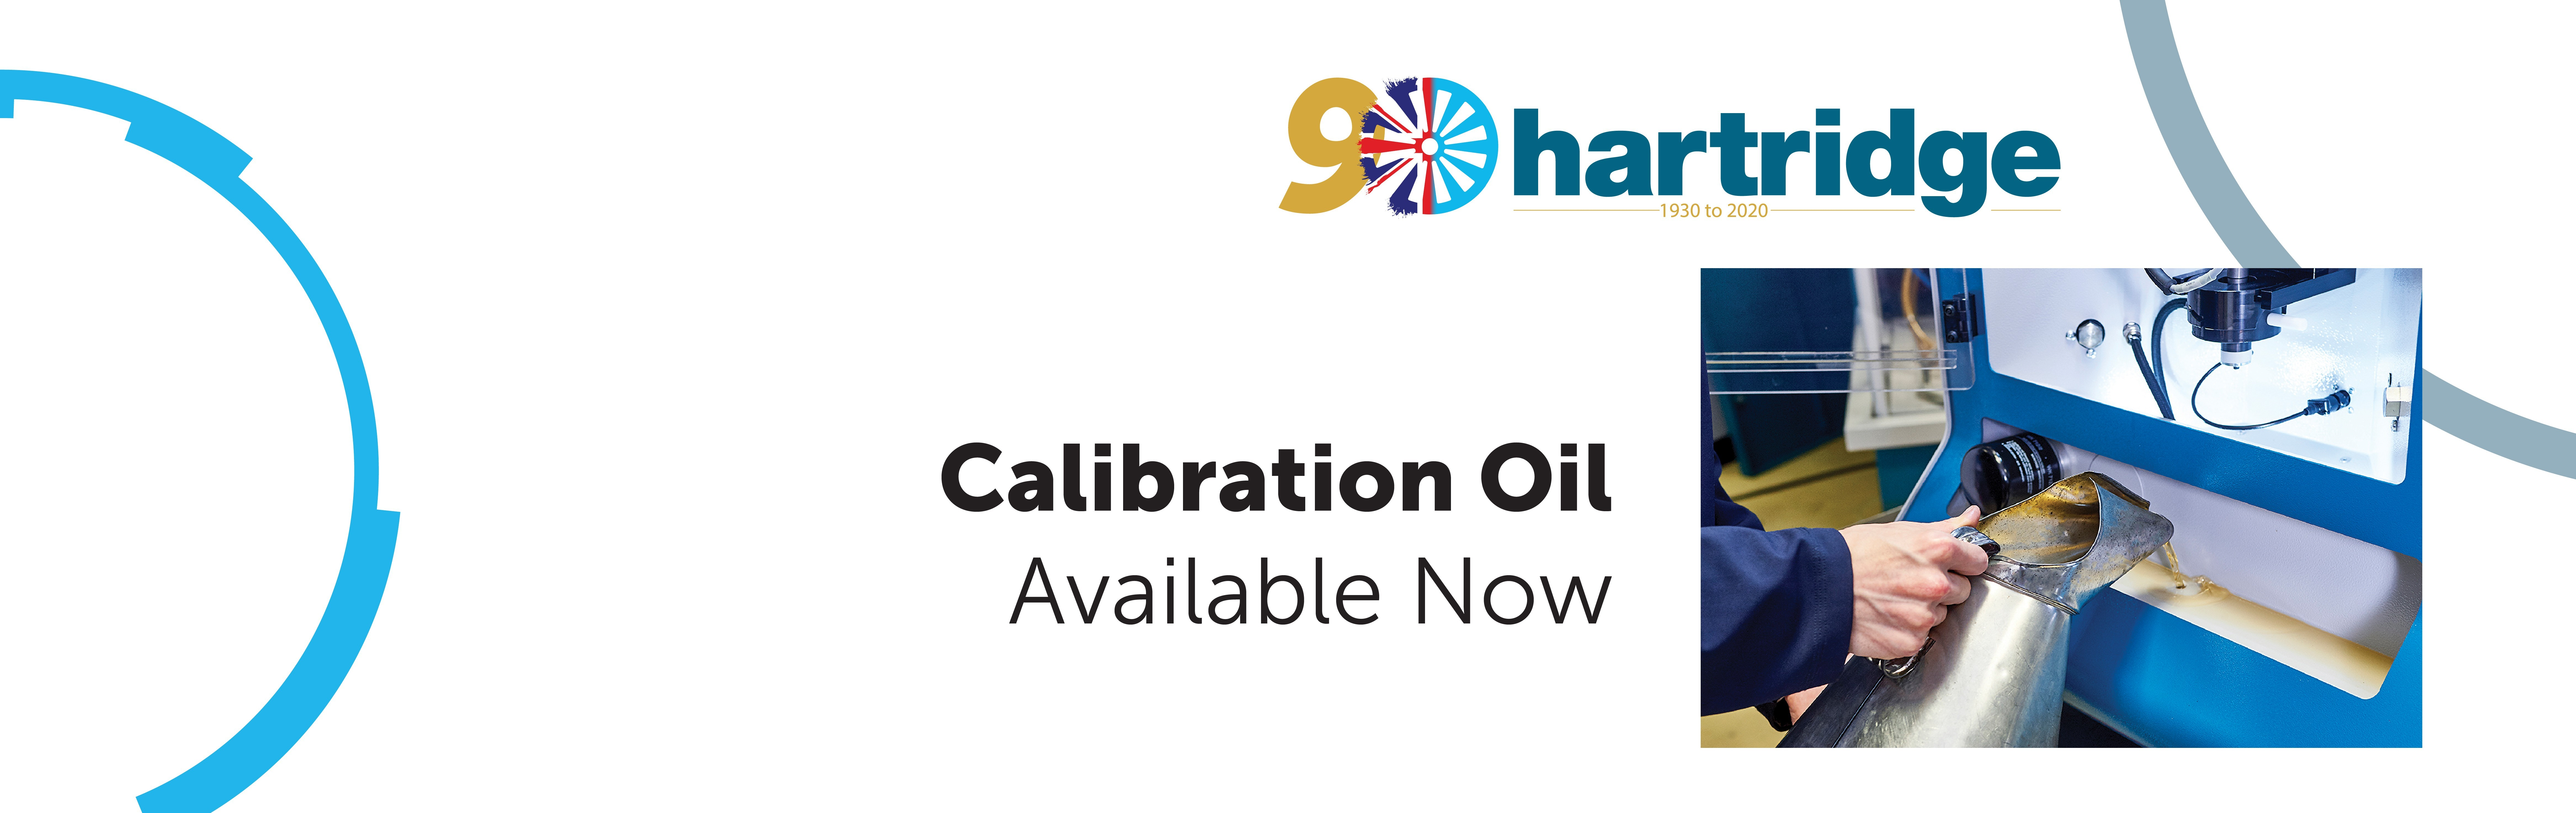 <p><a href='https://www.hartridge.shop/product-category/calibration-fluid/'>More Details</a></p>